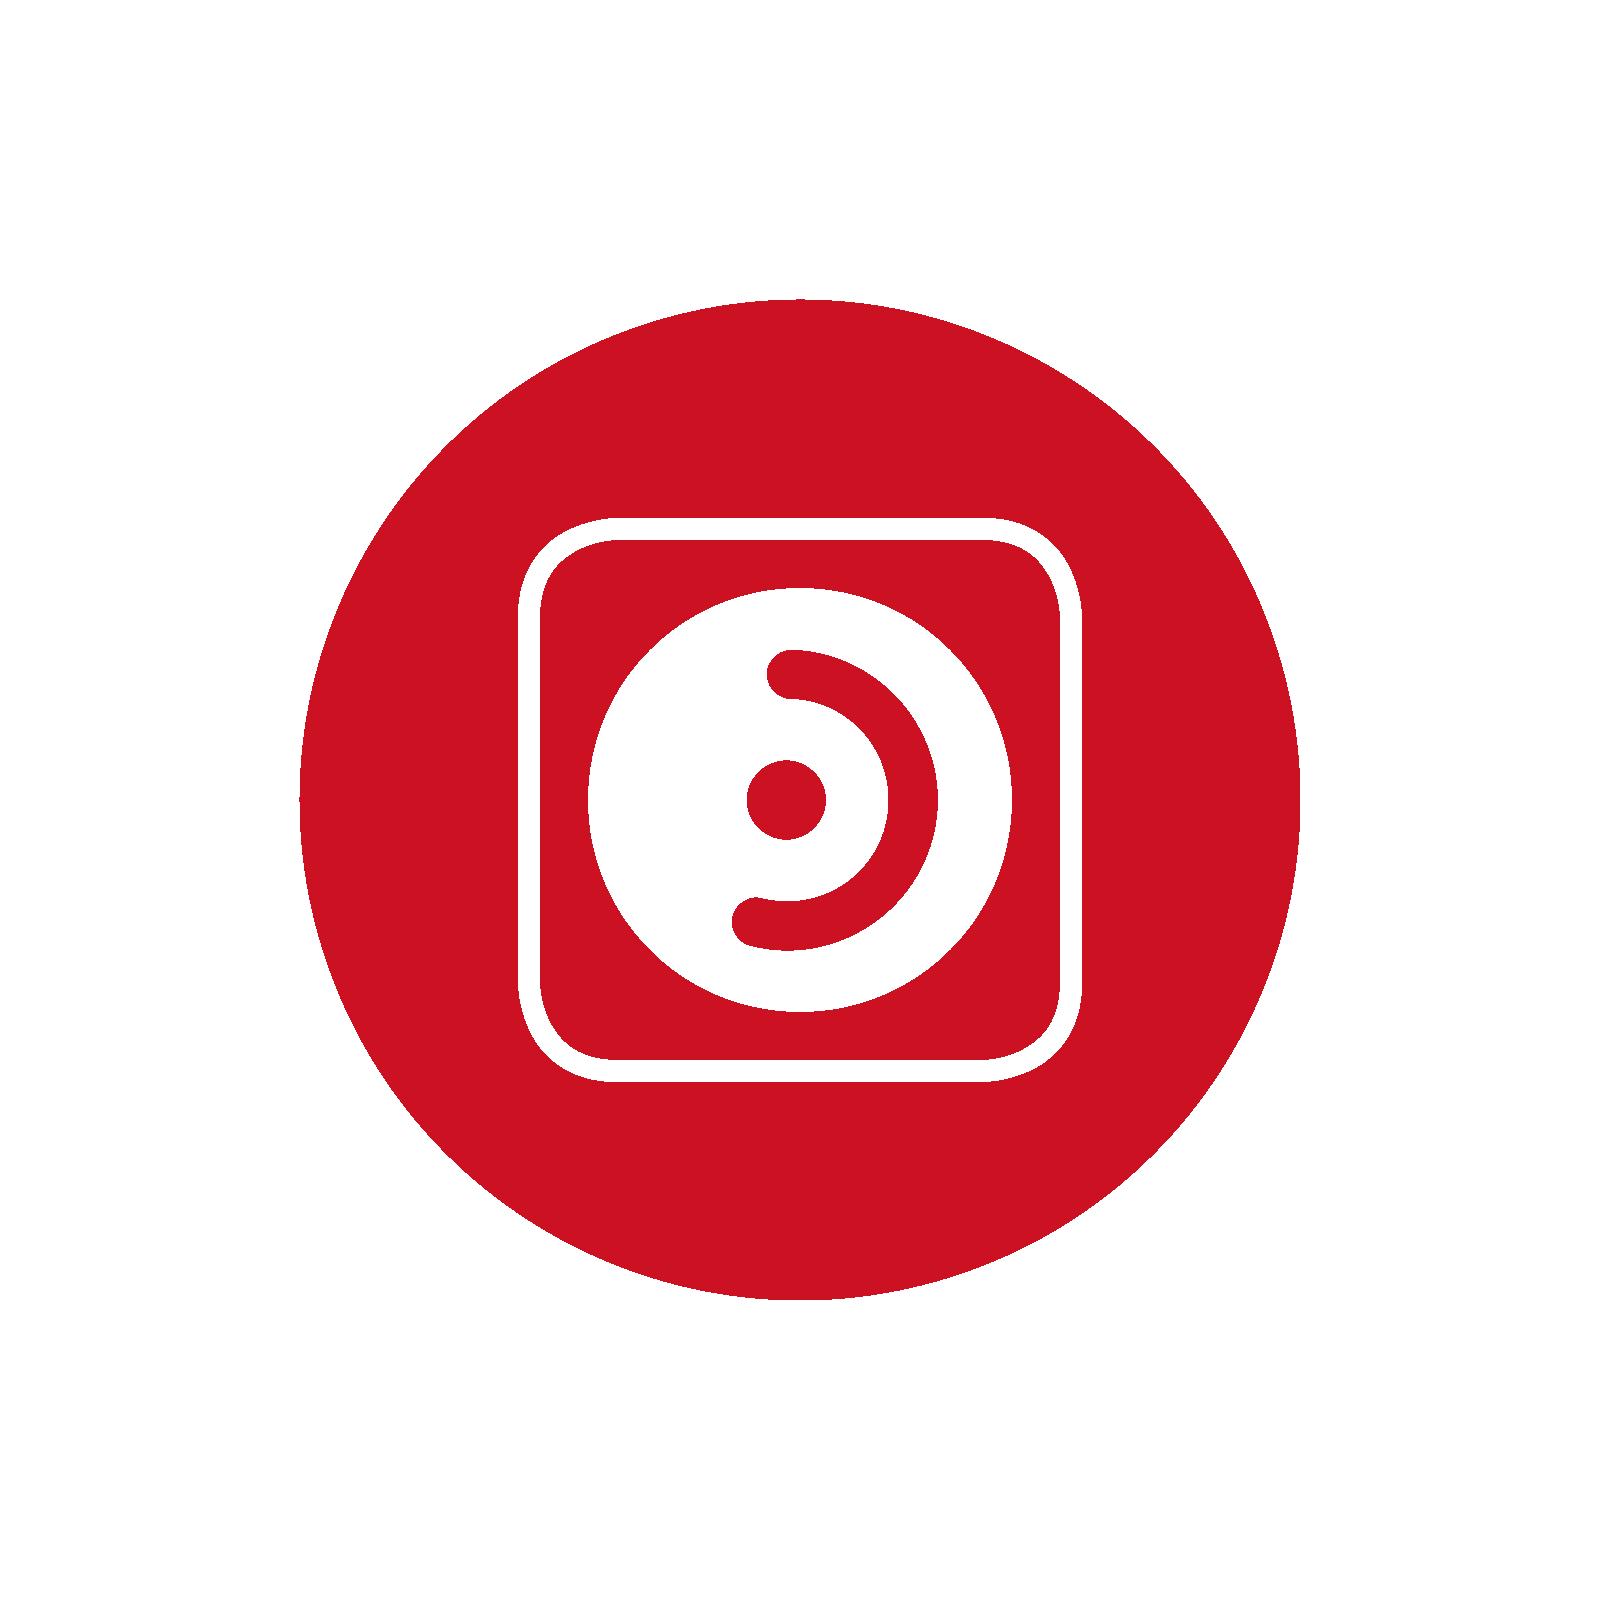 06_was-knnen_app_manufaktur